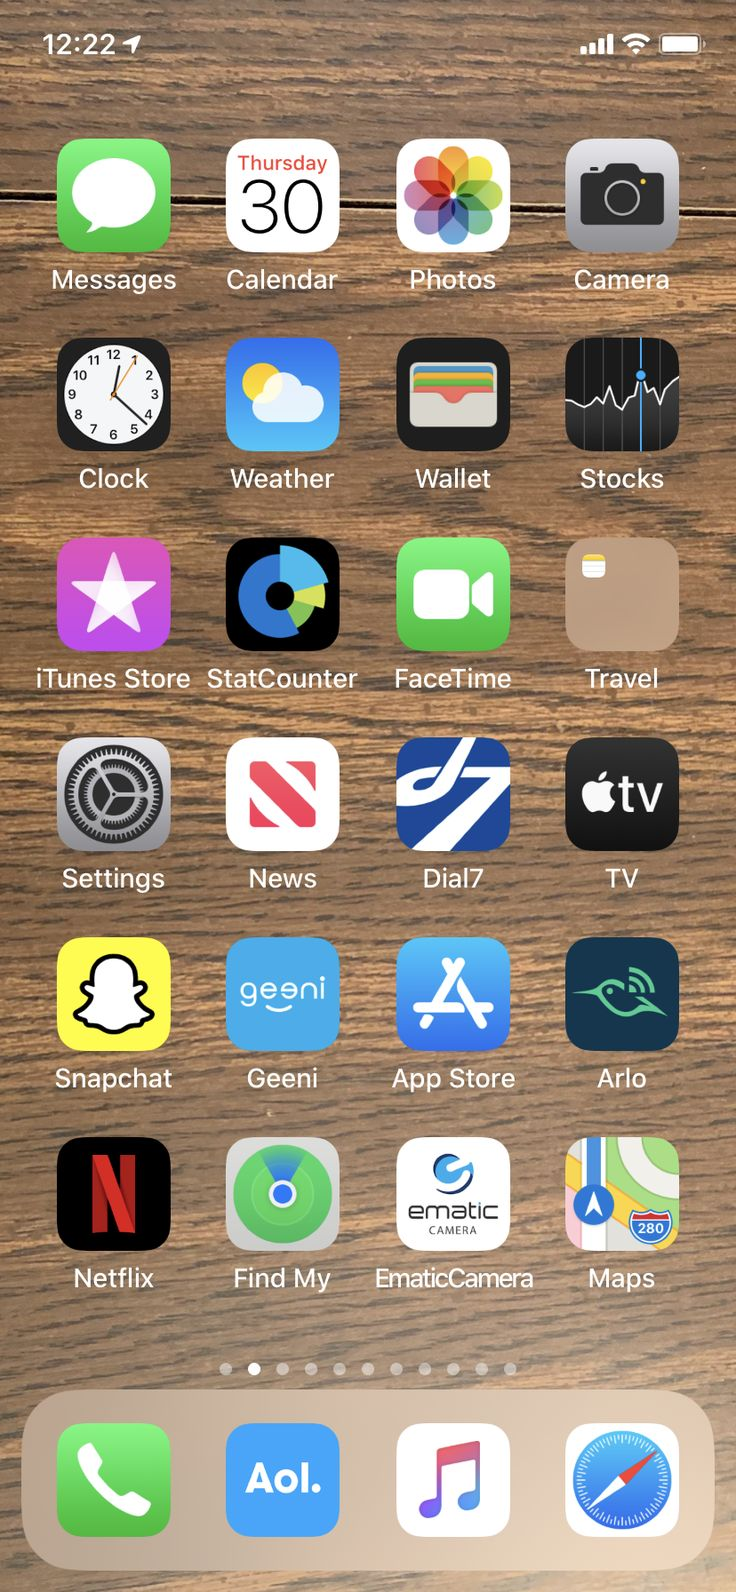 Apple iPhone Maps App Easier Then Ever! Apple iPhoneXr